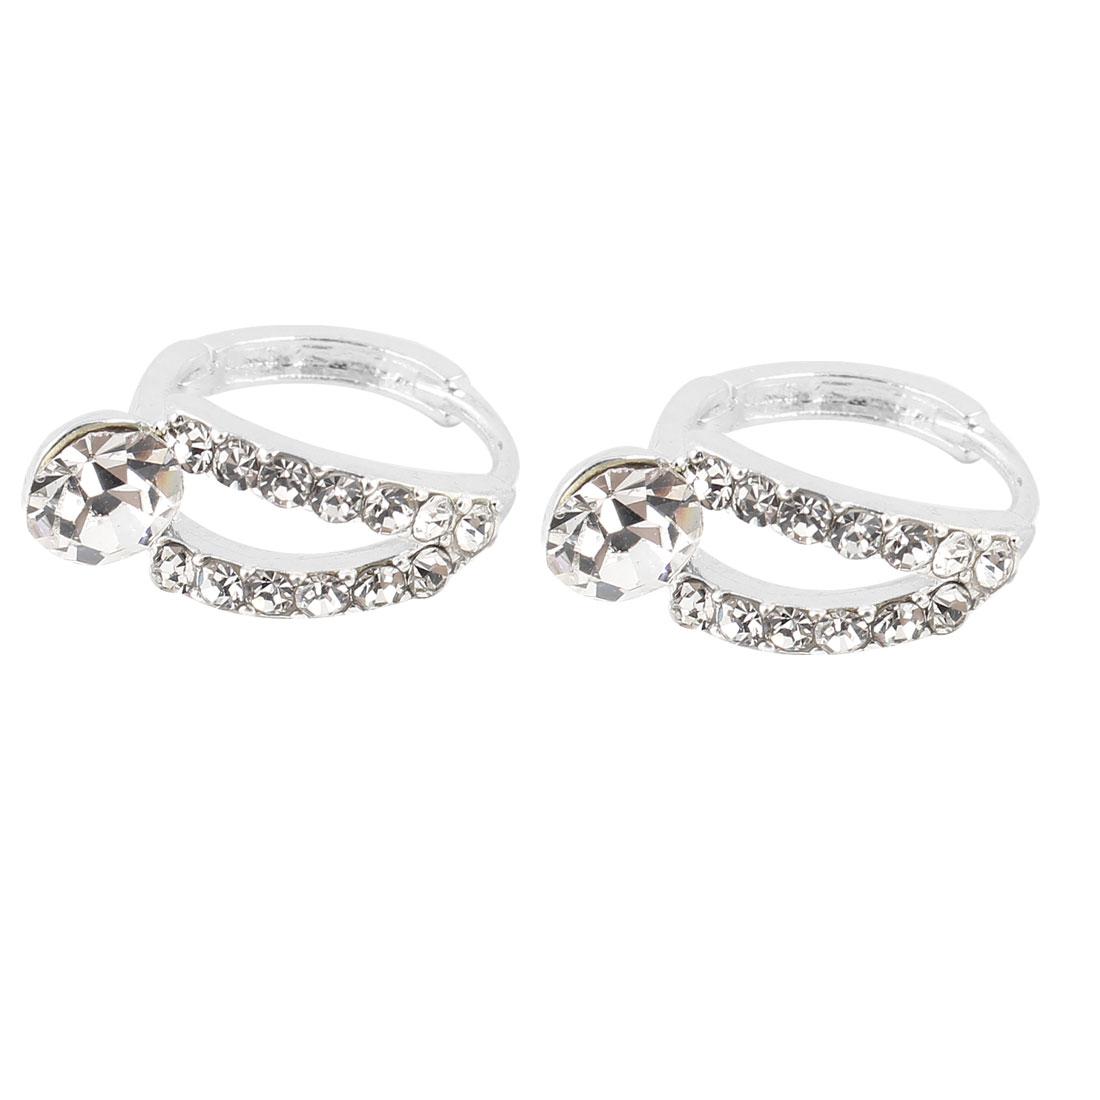 Ladies Pair Clear Glittery Rhinestone Decor Pierced Hoop Earrings